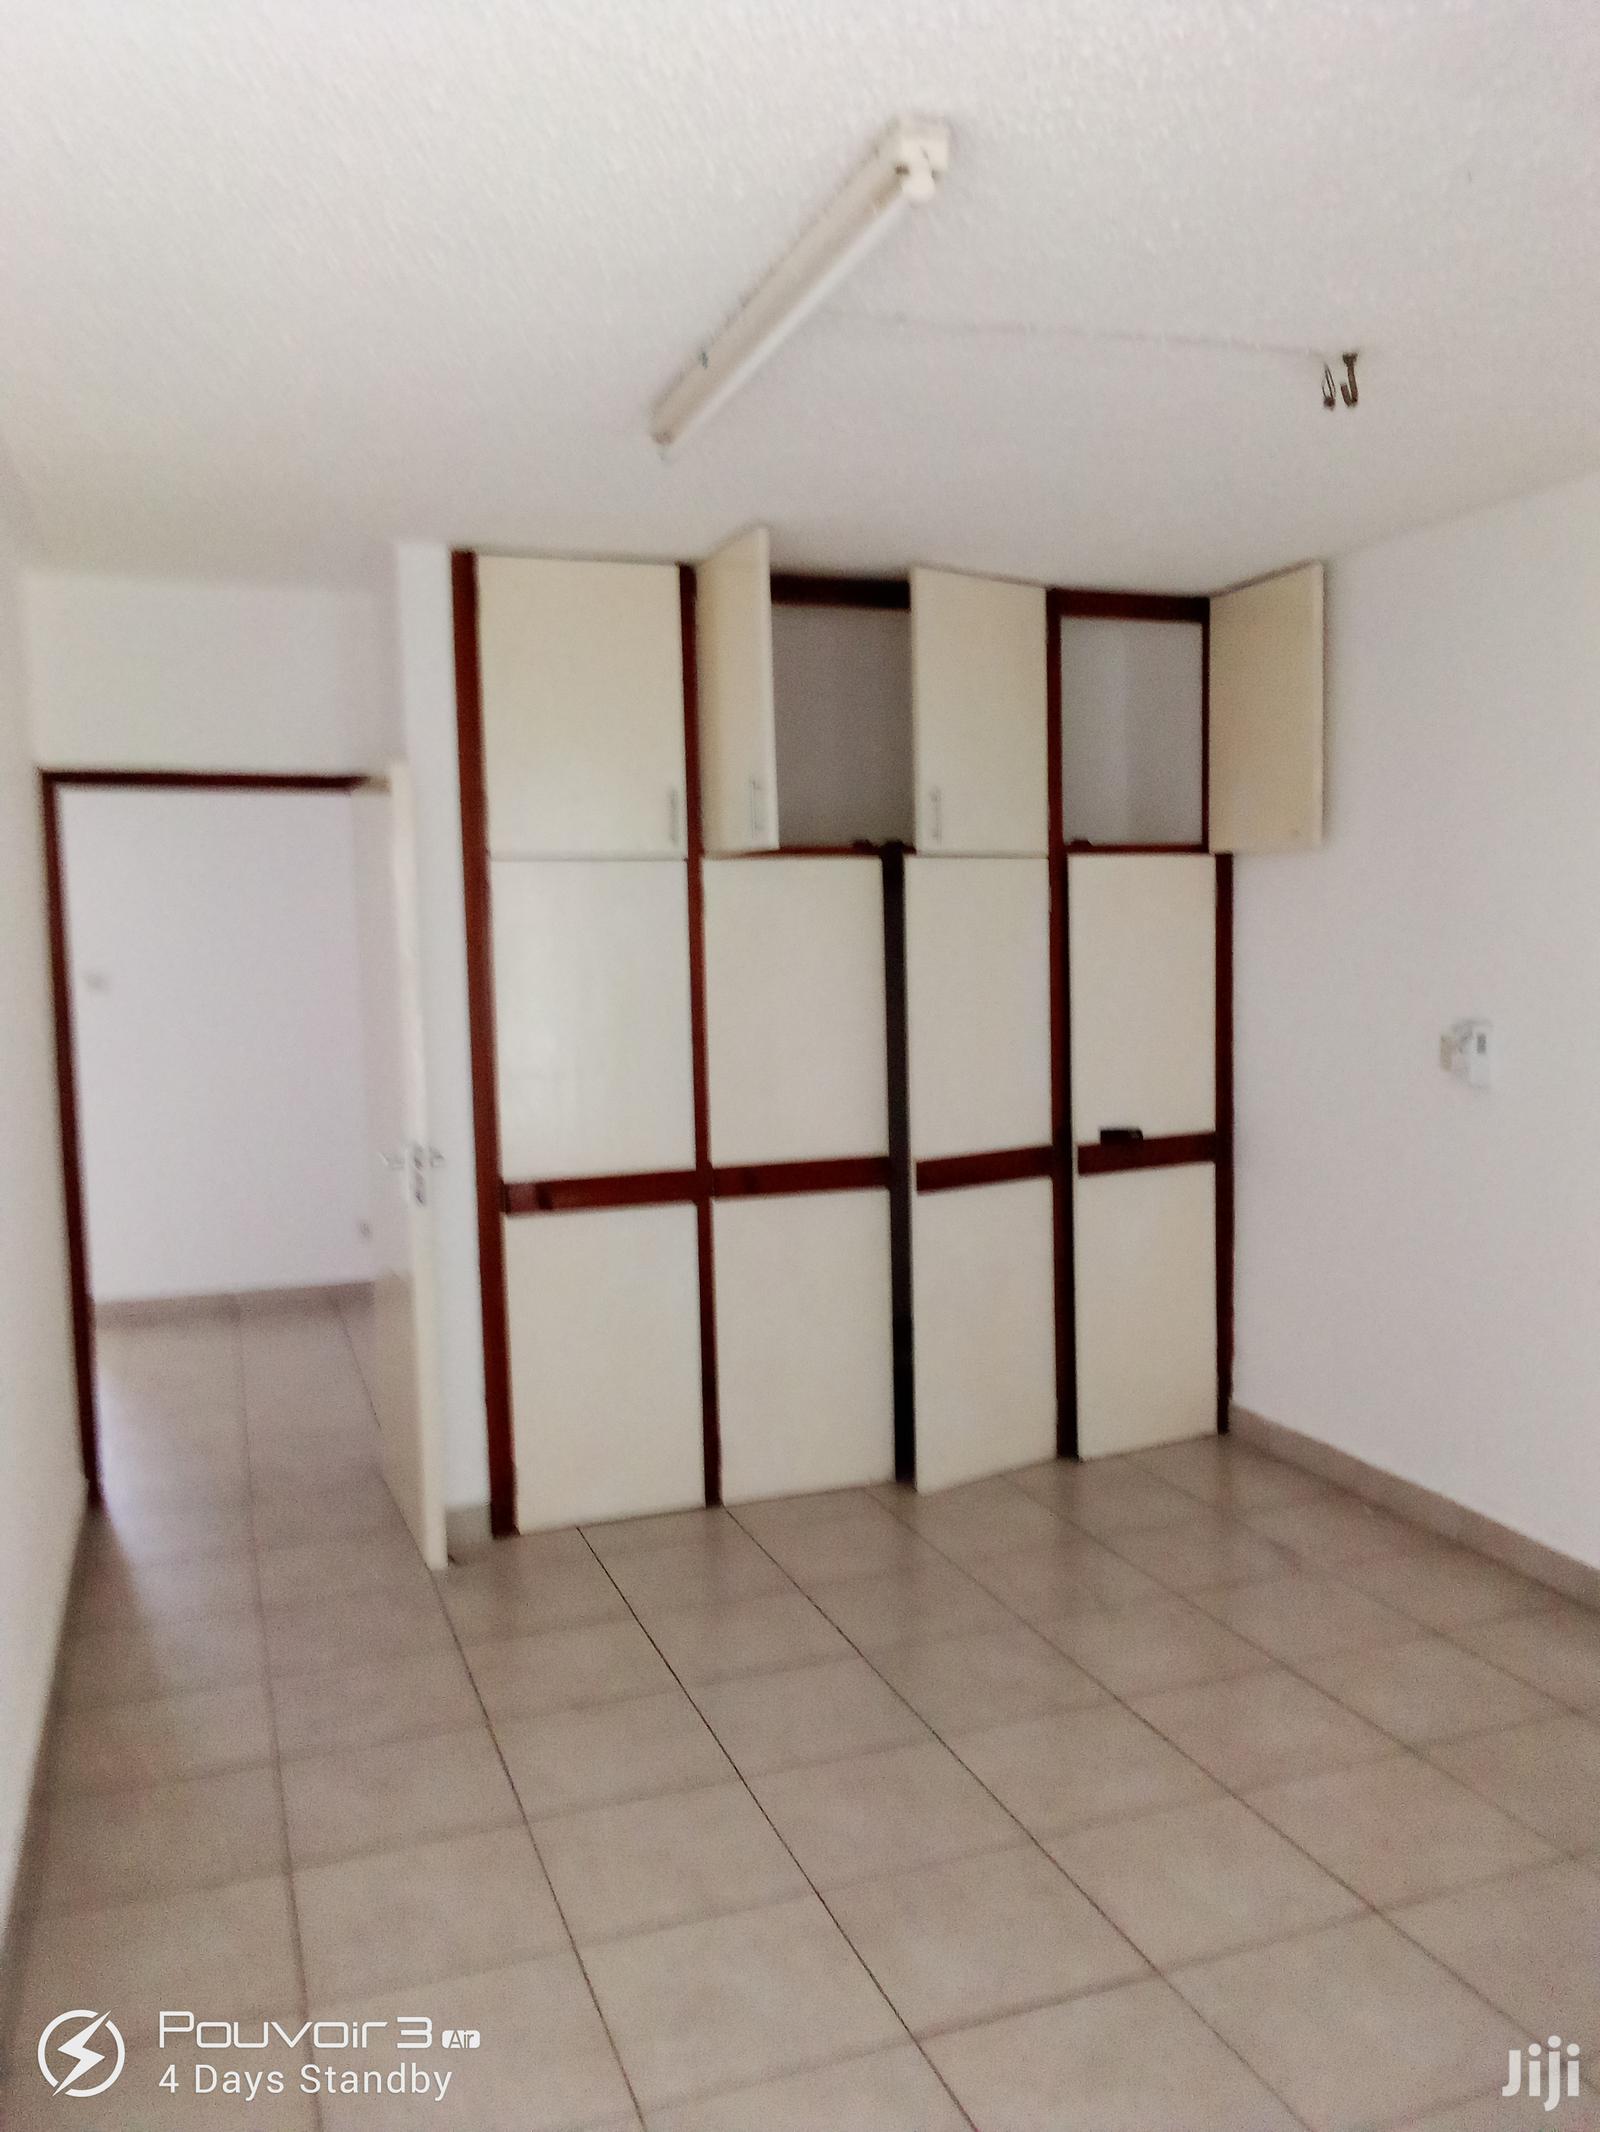 3 Bedroom Duplex Nyerere Avenue   Houses & Apartments For Sale for sale in Mvita, Mombasa, Kenya